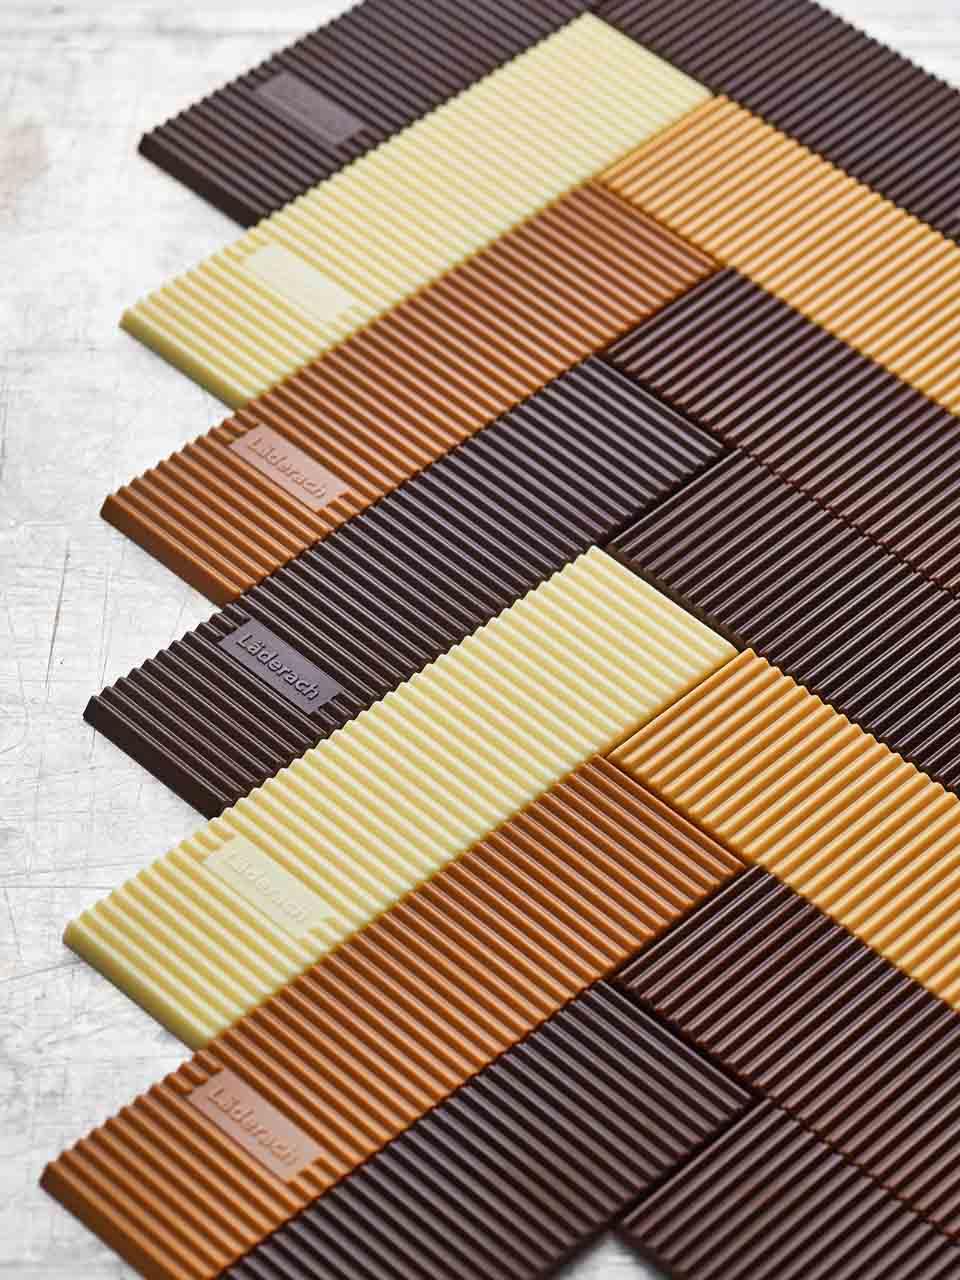 Läderach Schokolade